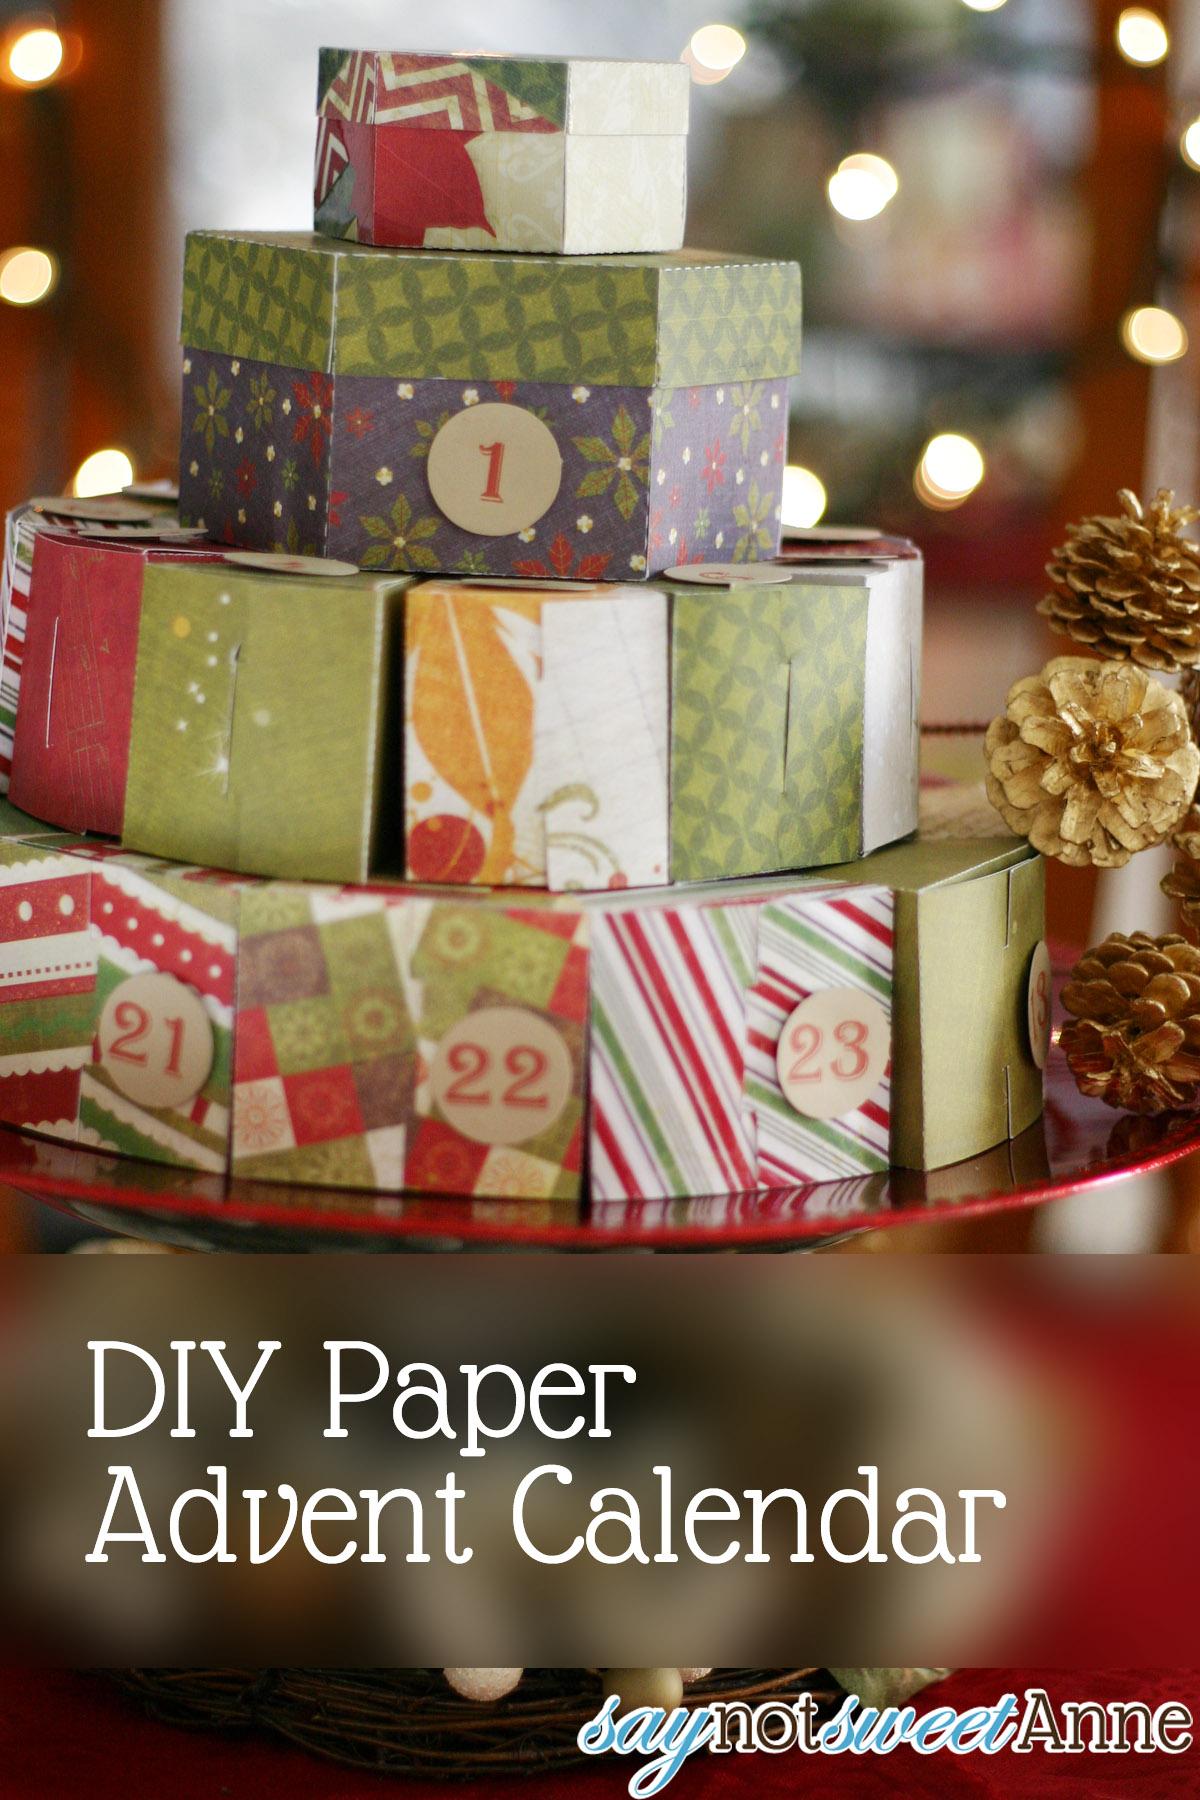 Diy Paper Advent Calendar Sweet Anne Designs